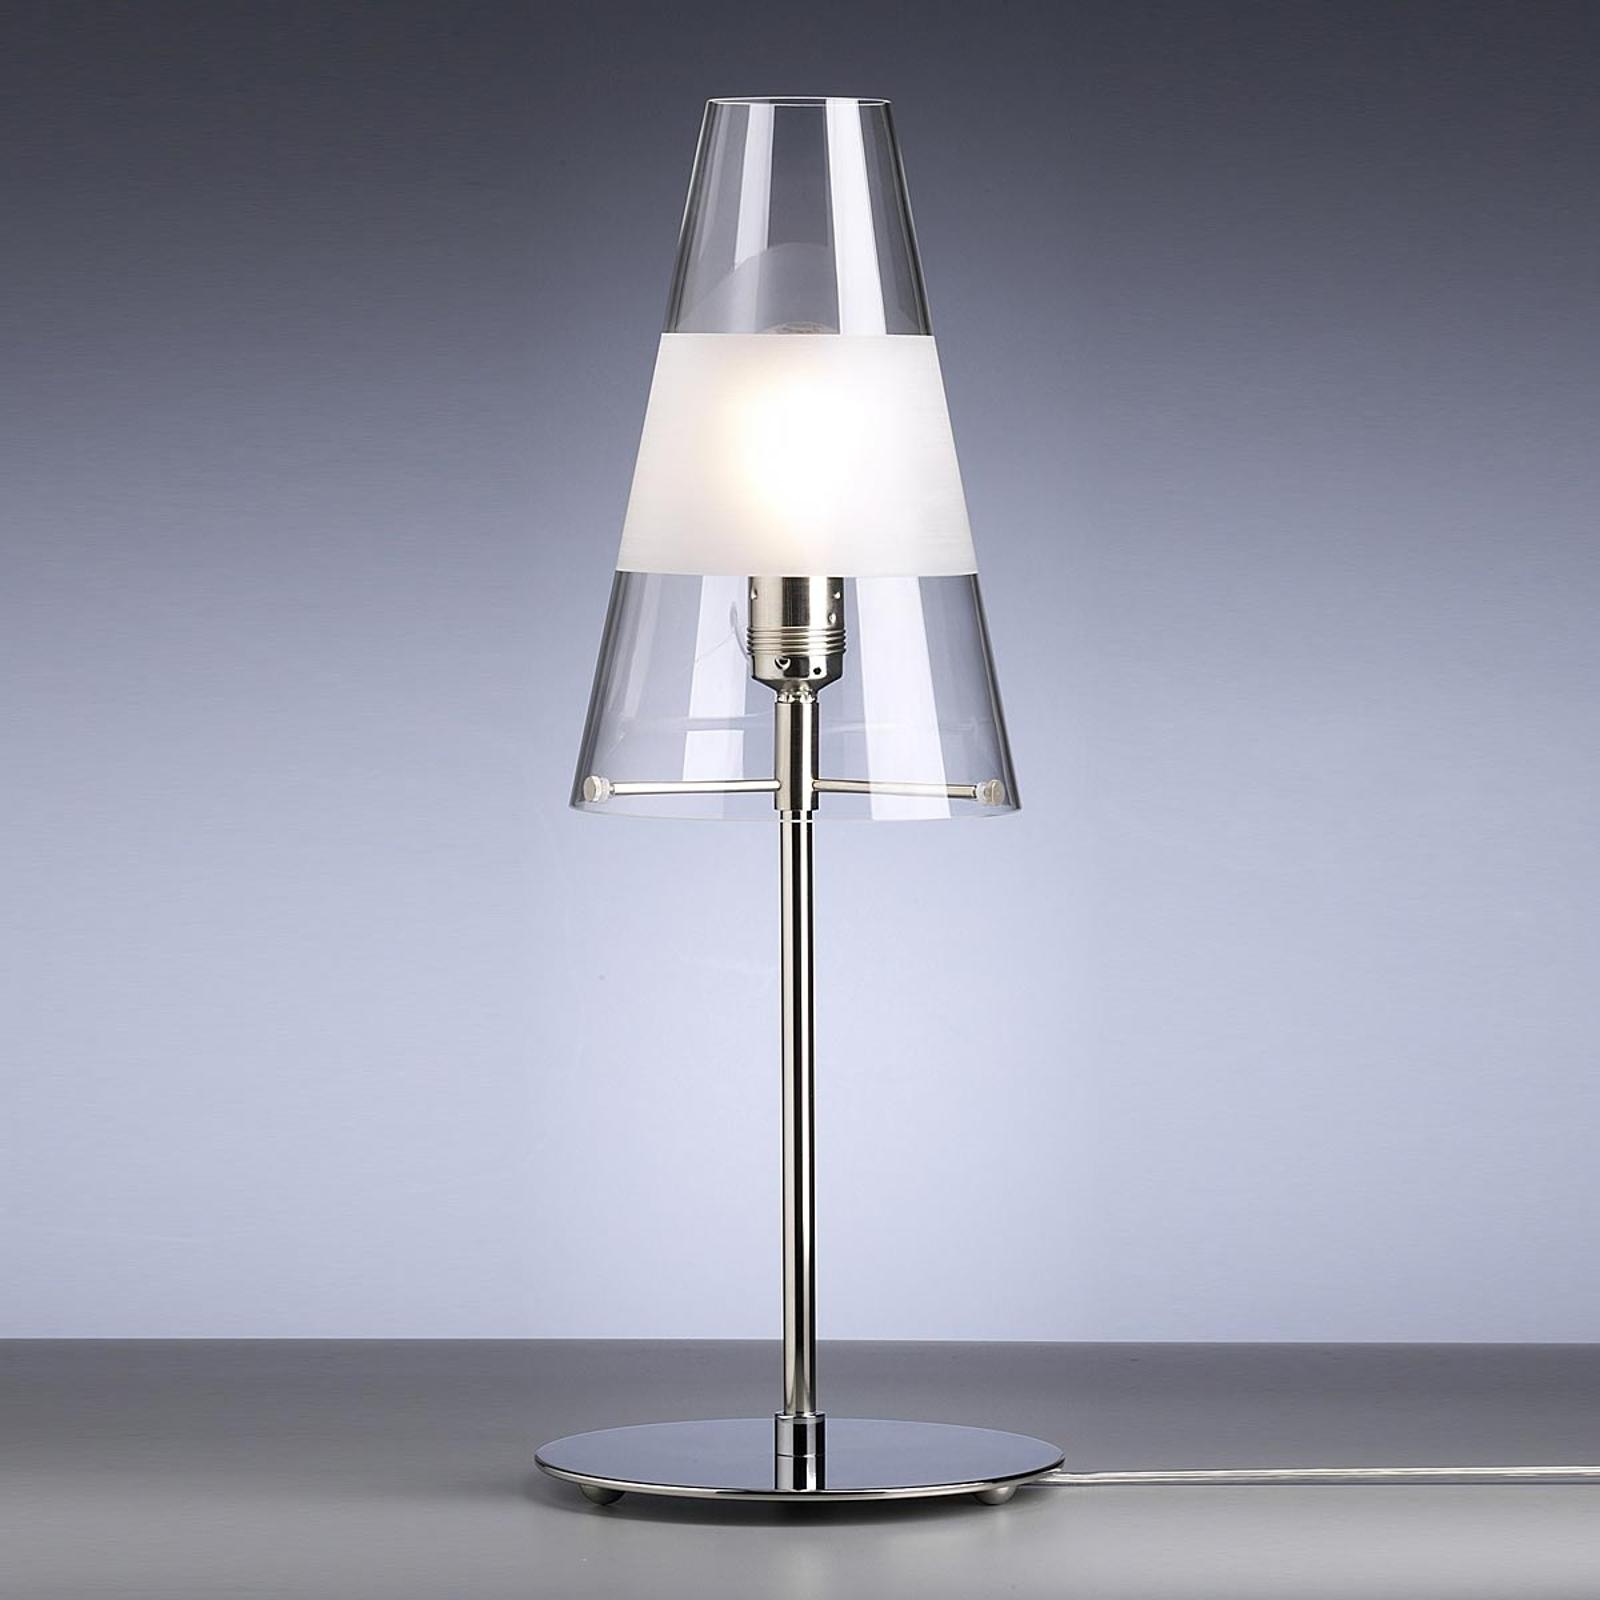 Tafellamp van Walter Schnepel, helder m. ring, mat